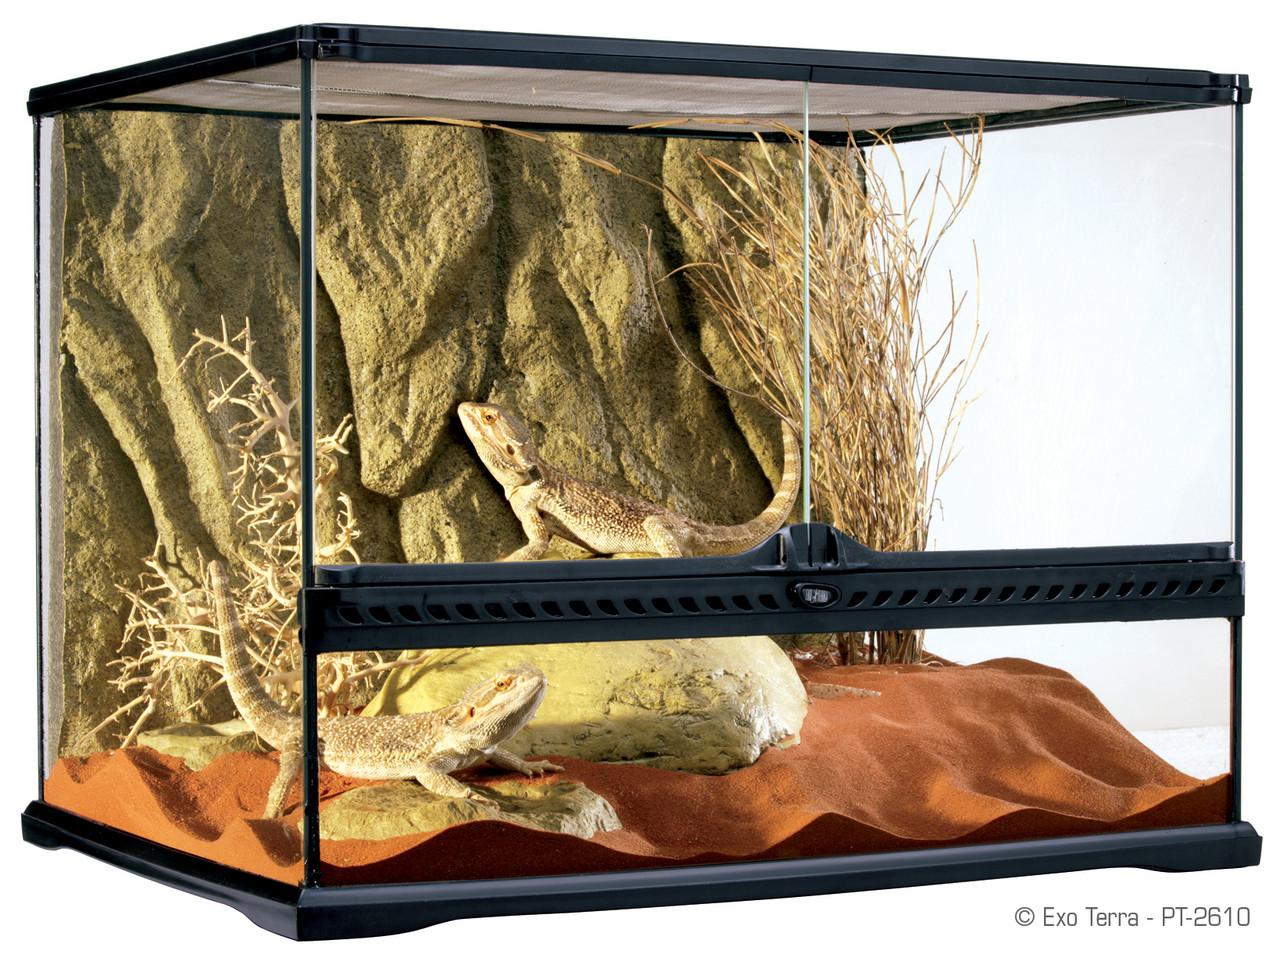 Exo Terra Natural Terrarium Medium 60 X 45 X 45 Cm 24 X 18 X 18